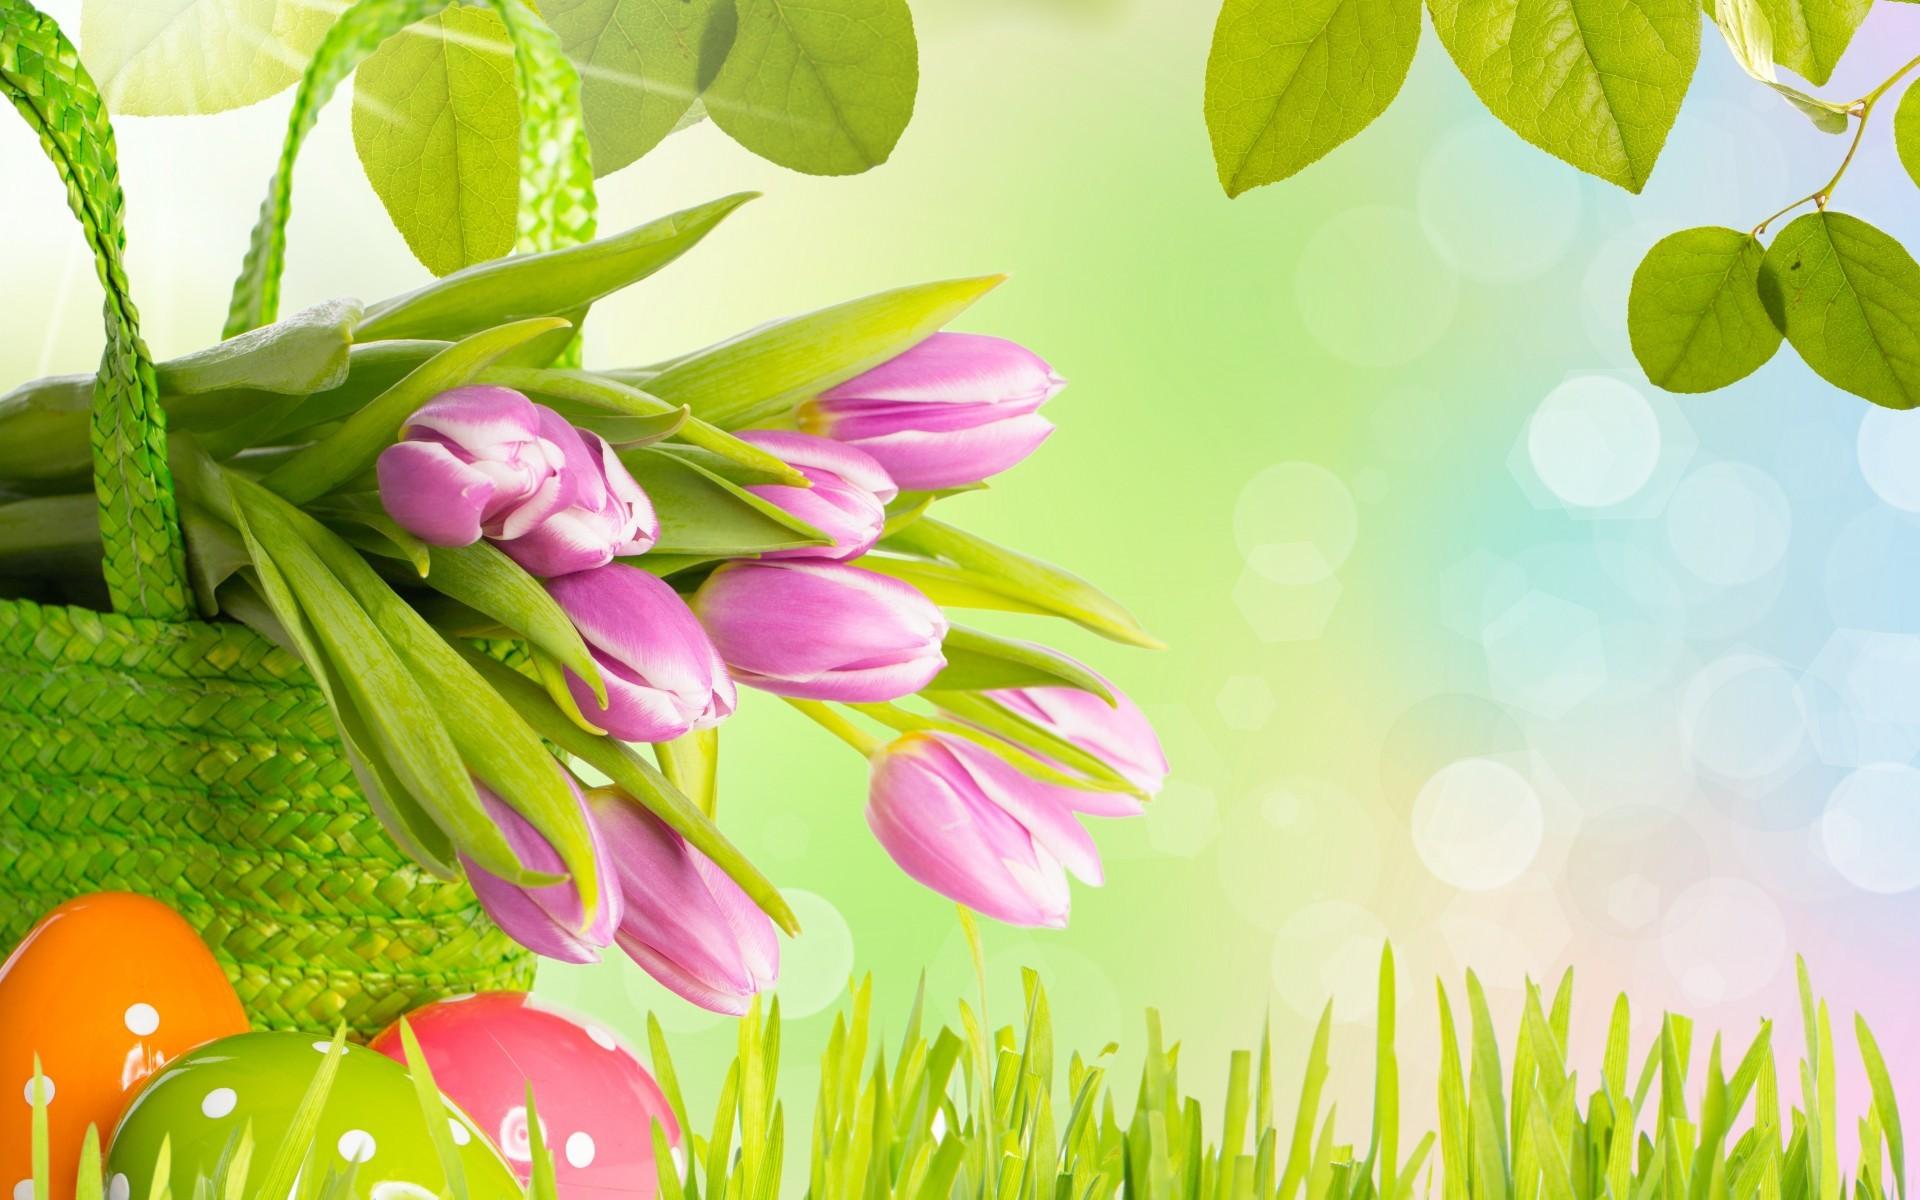 Happy Easter wallpaper free | Adorable Wallpaper & Elegant Backgrounds |  Pinterest | Happy easter wallpaper, Easter wallpaper and Happy easter